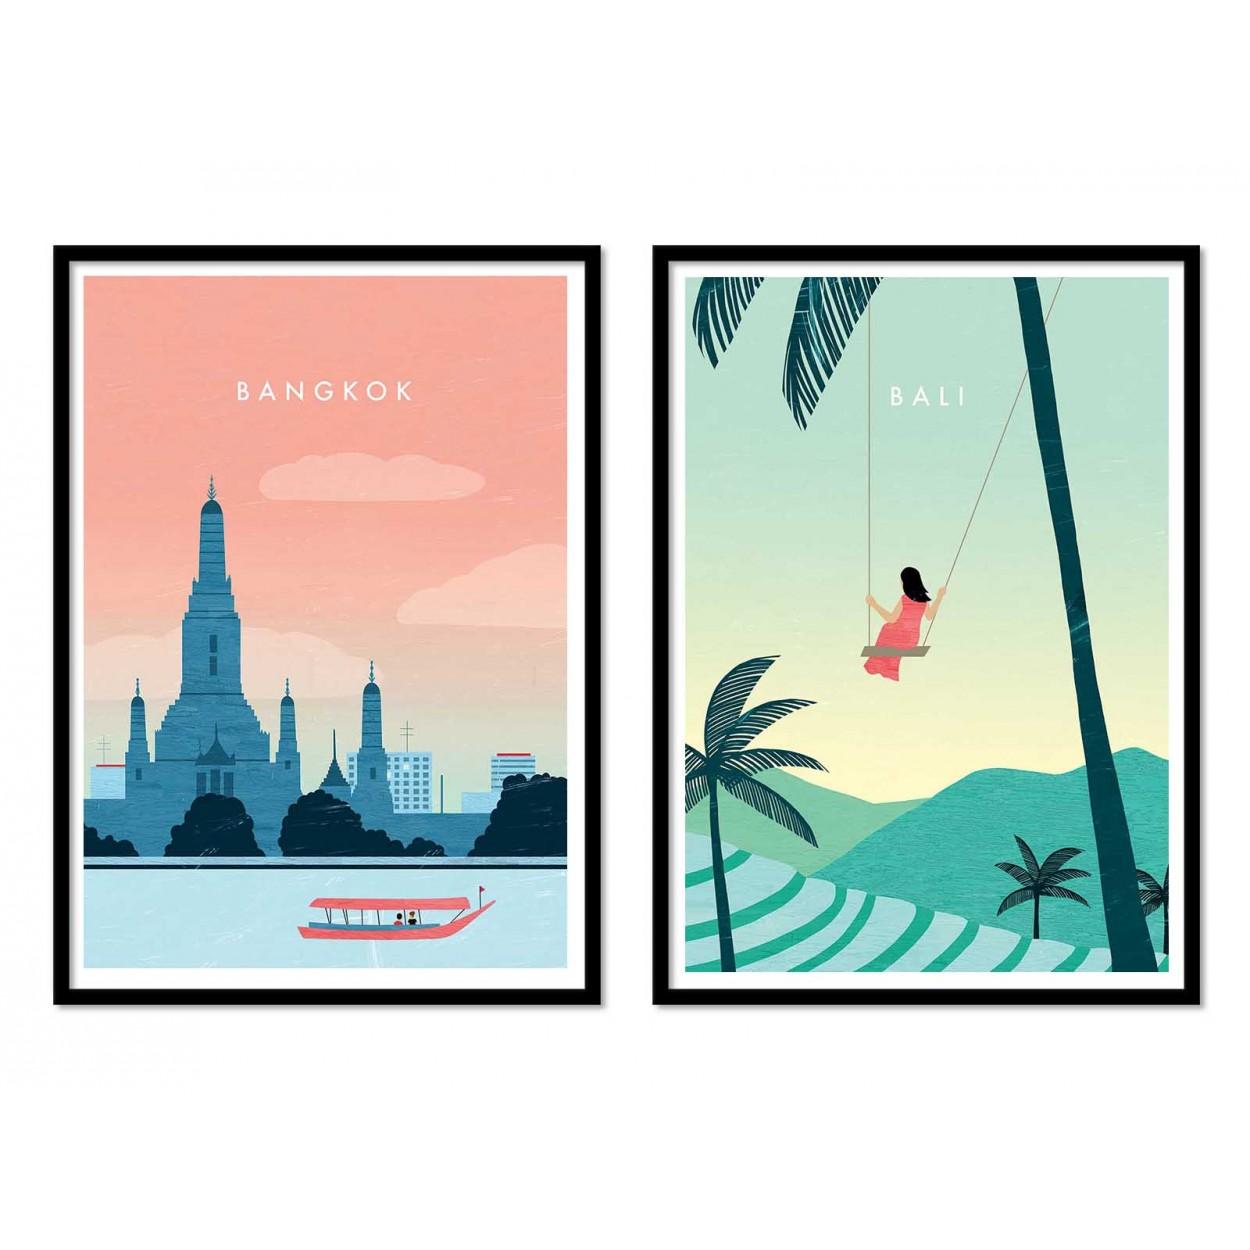 Illustration Art Poster Frame Print And Digital Of Travel Posters